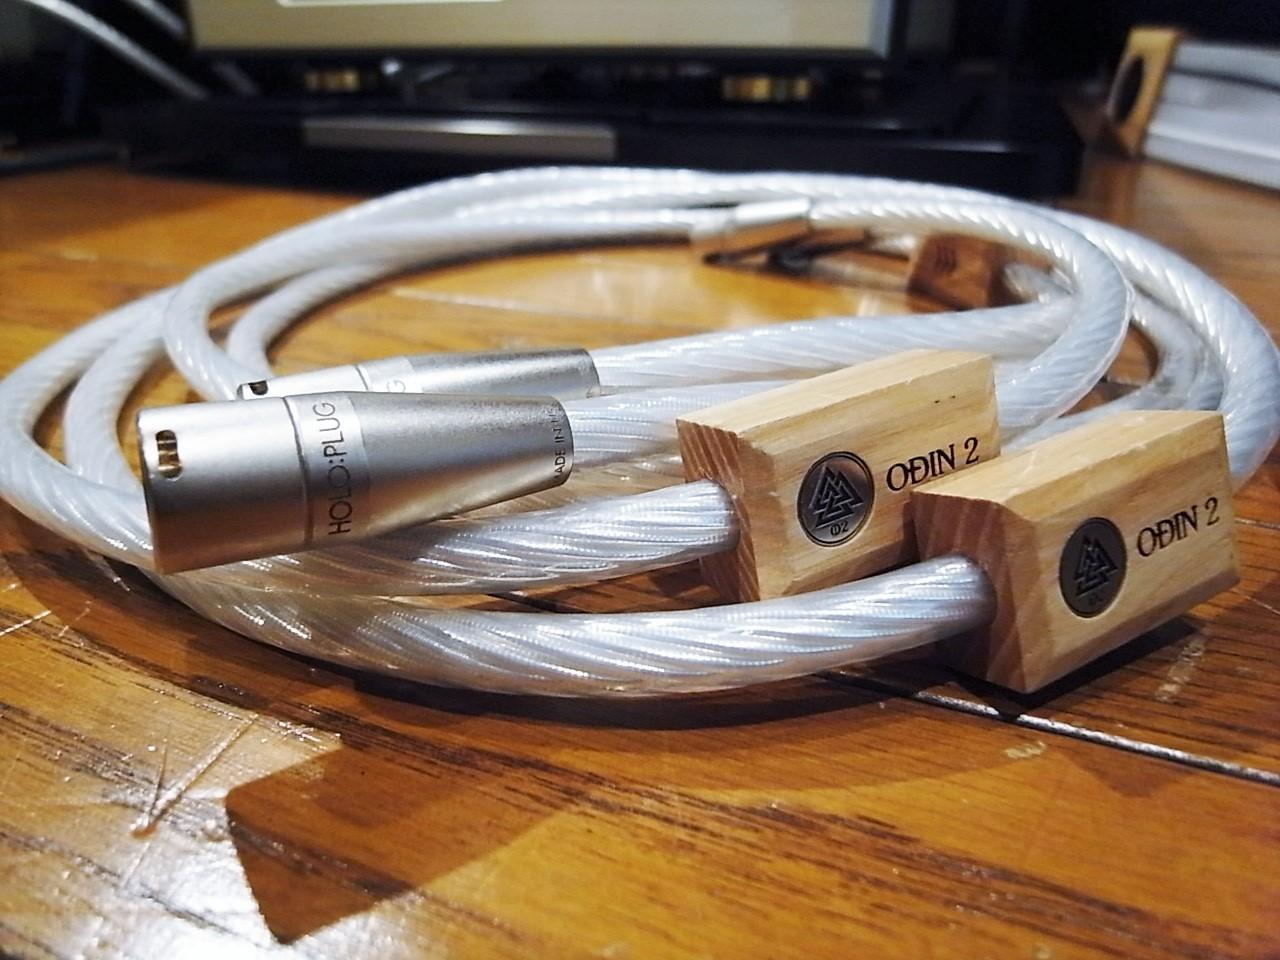 NORDOST ODIN2 XLR Cables